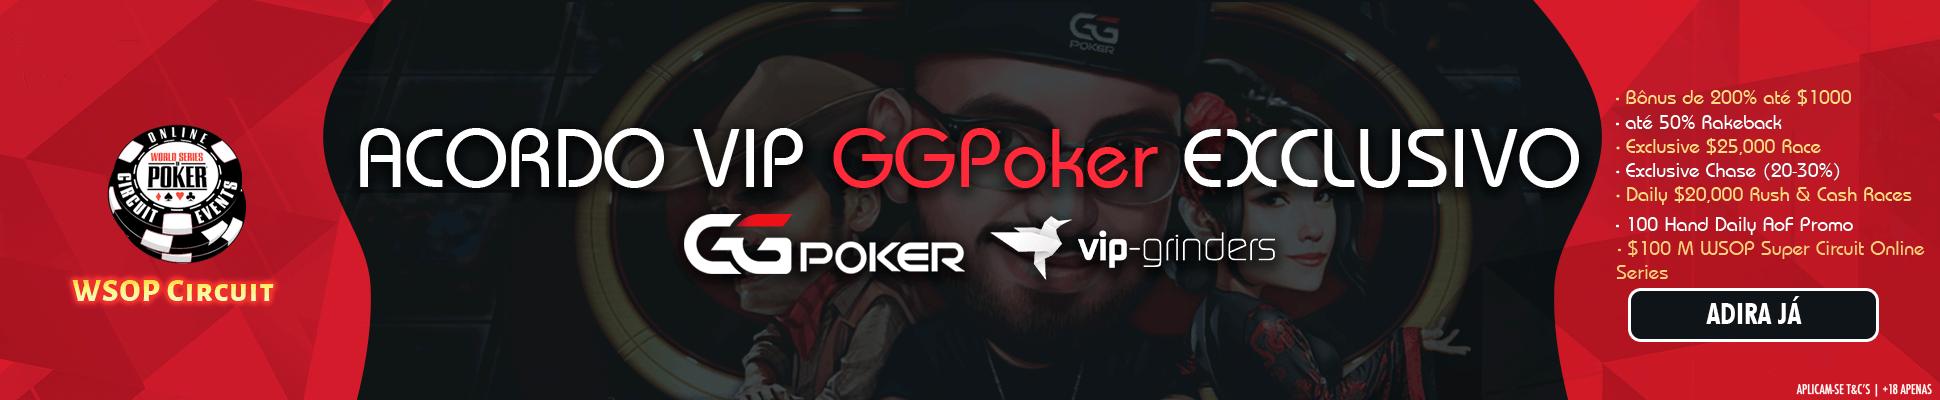 ggpoker-banner-MAIO-2